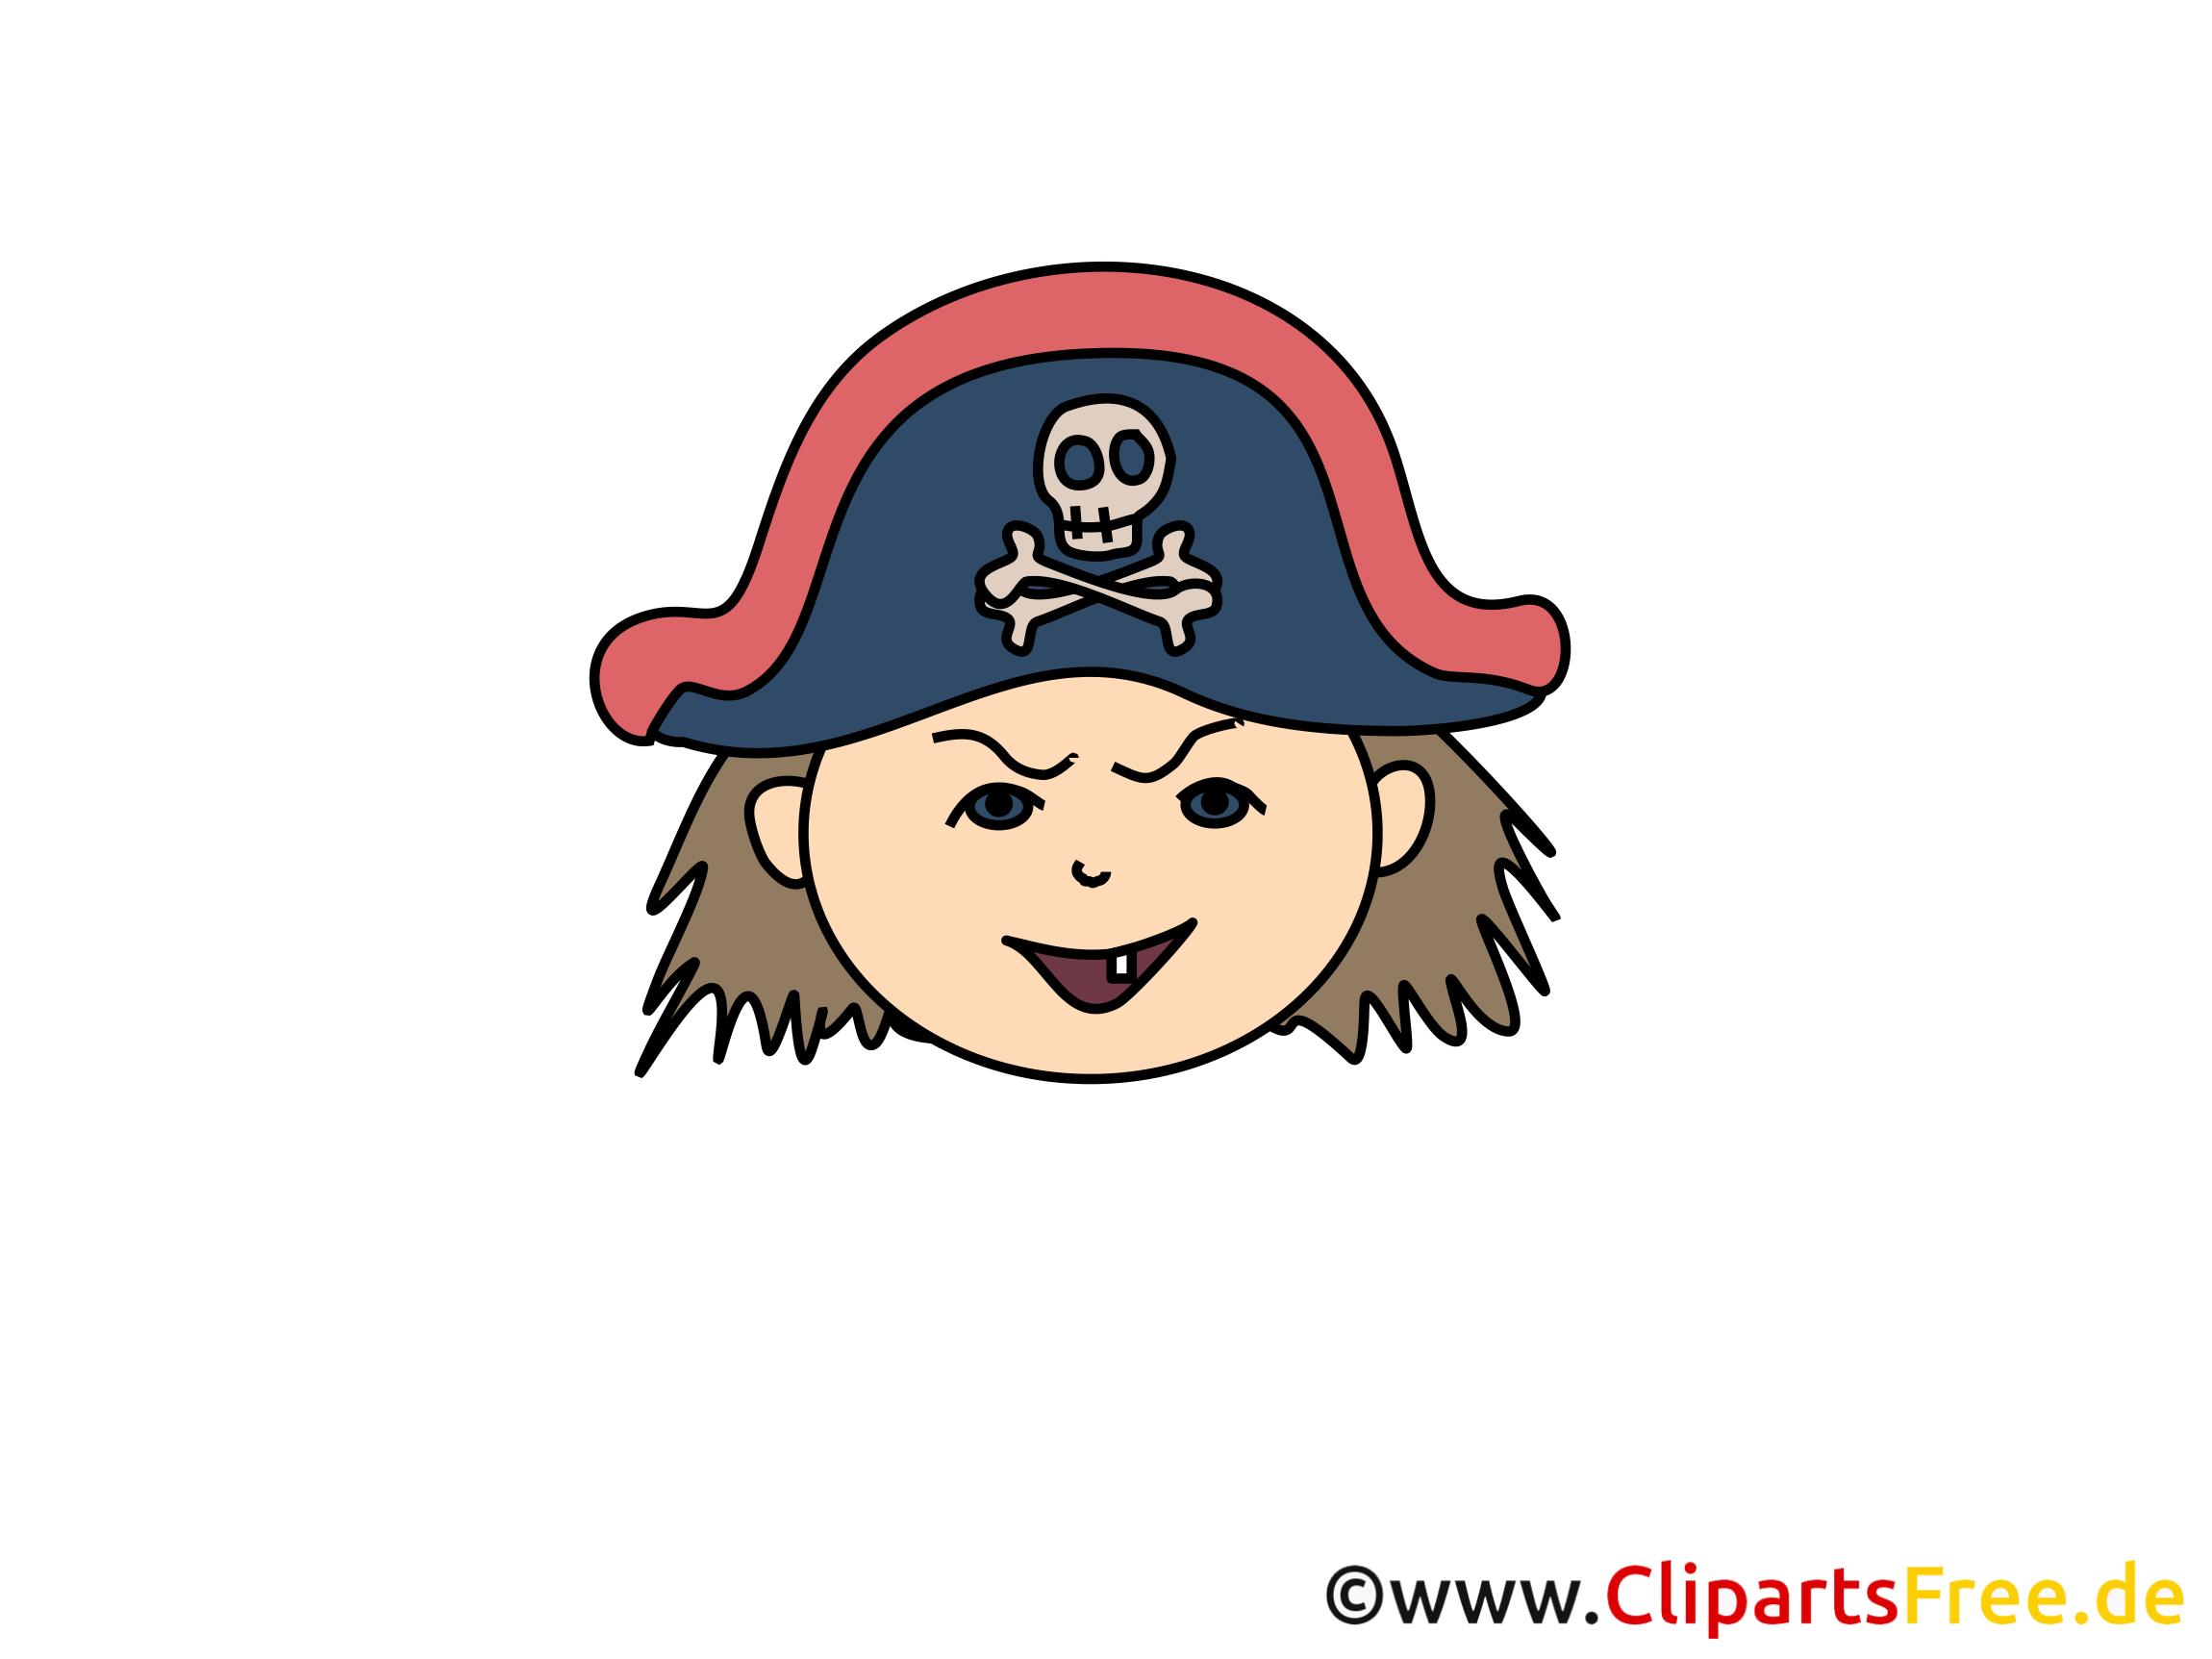 Pirate Clip Art Free Clipart Panda - Pirate Clipart - Png Download  (#1203249) - PinClipart